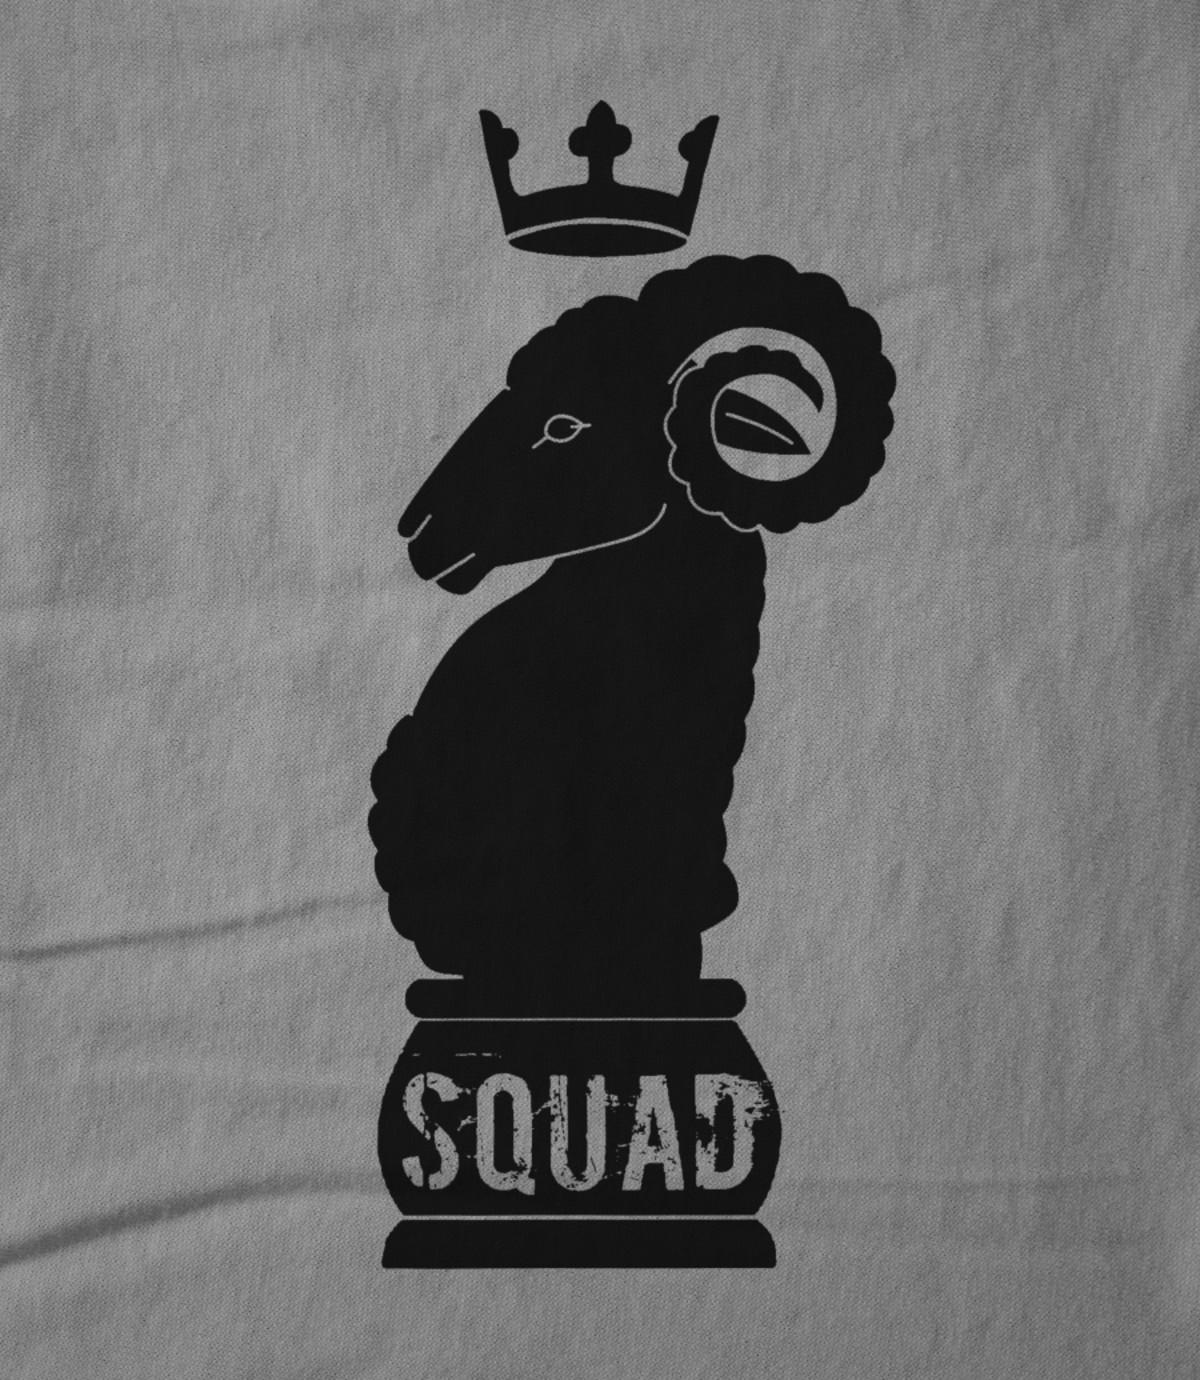 Black sheep squad bss logo 1537670152